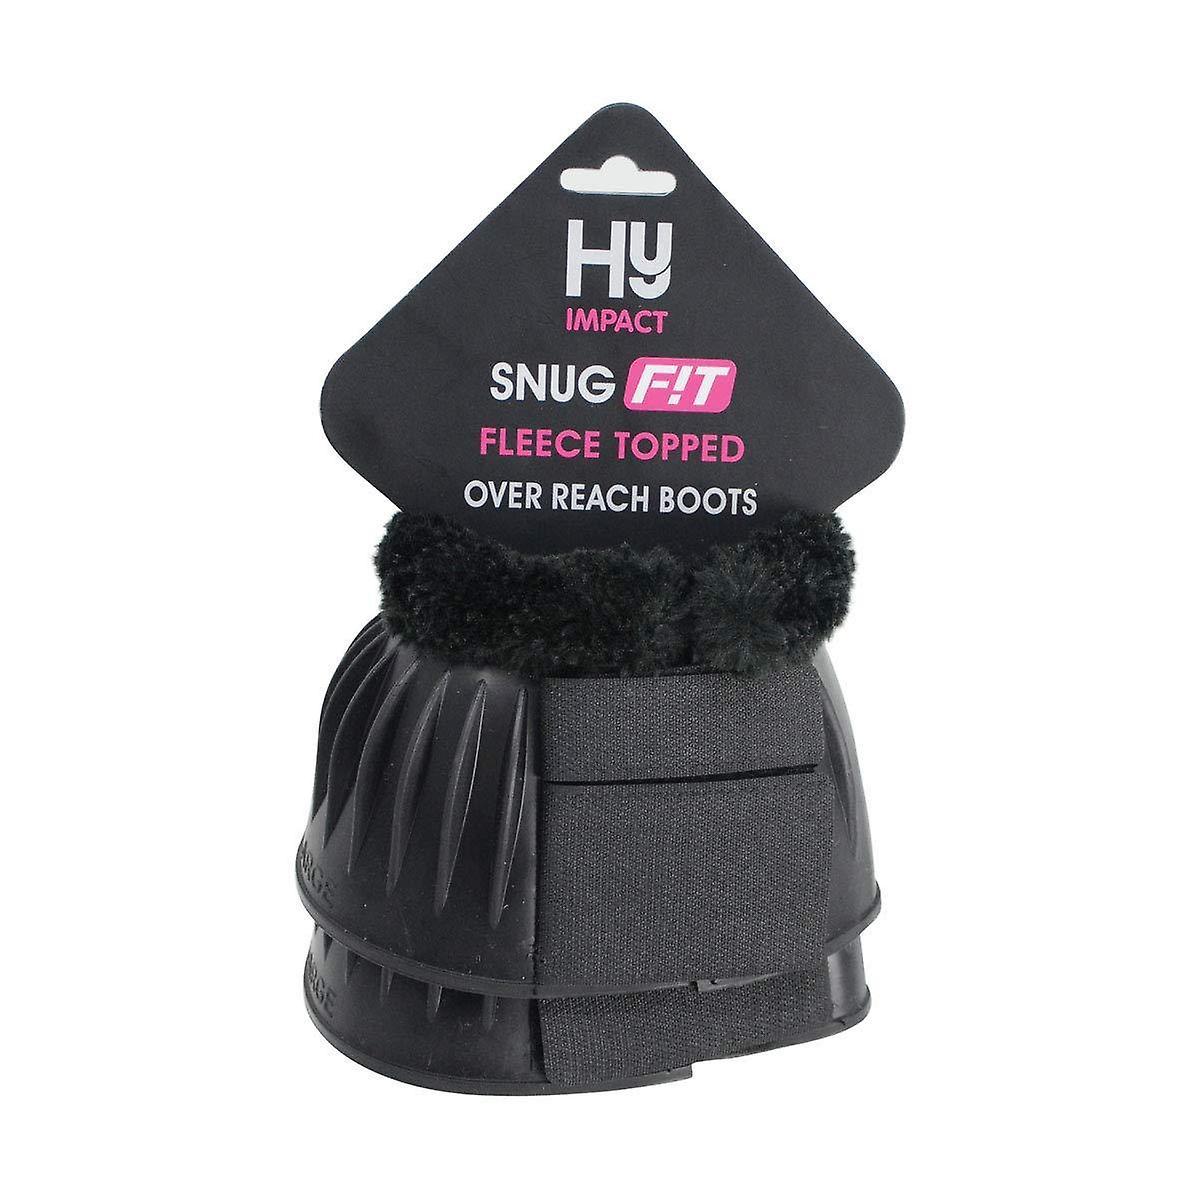 HyImpact SnugFit Fleece Topped Over Reach Boots